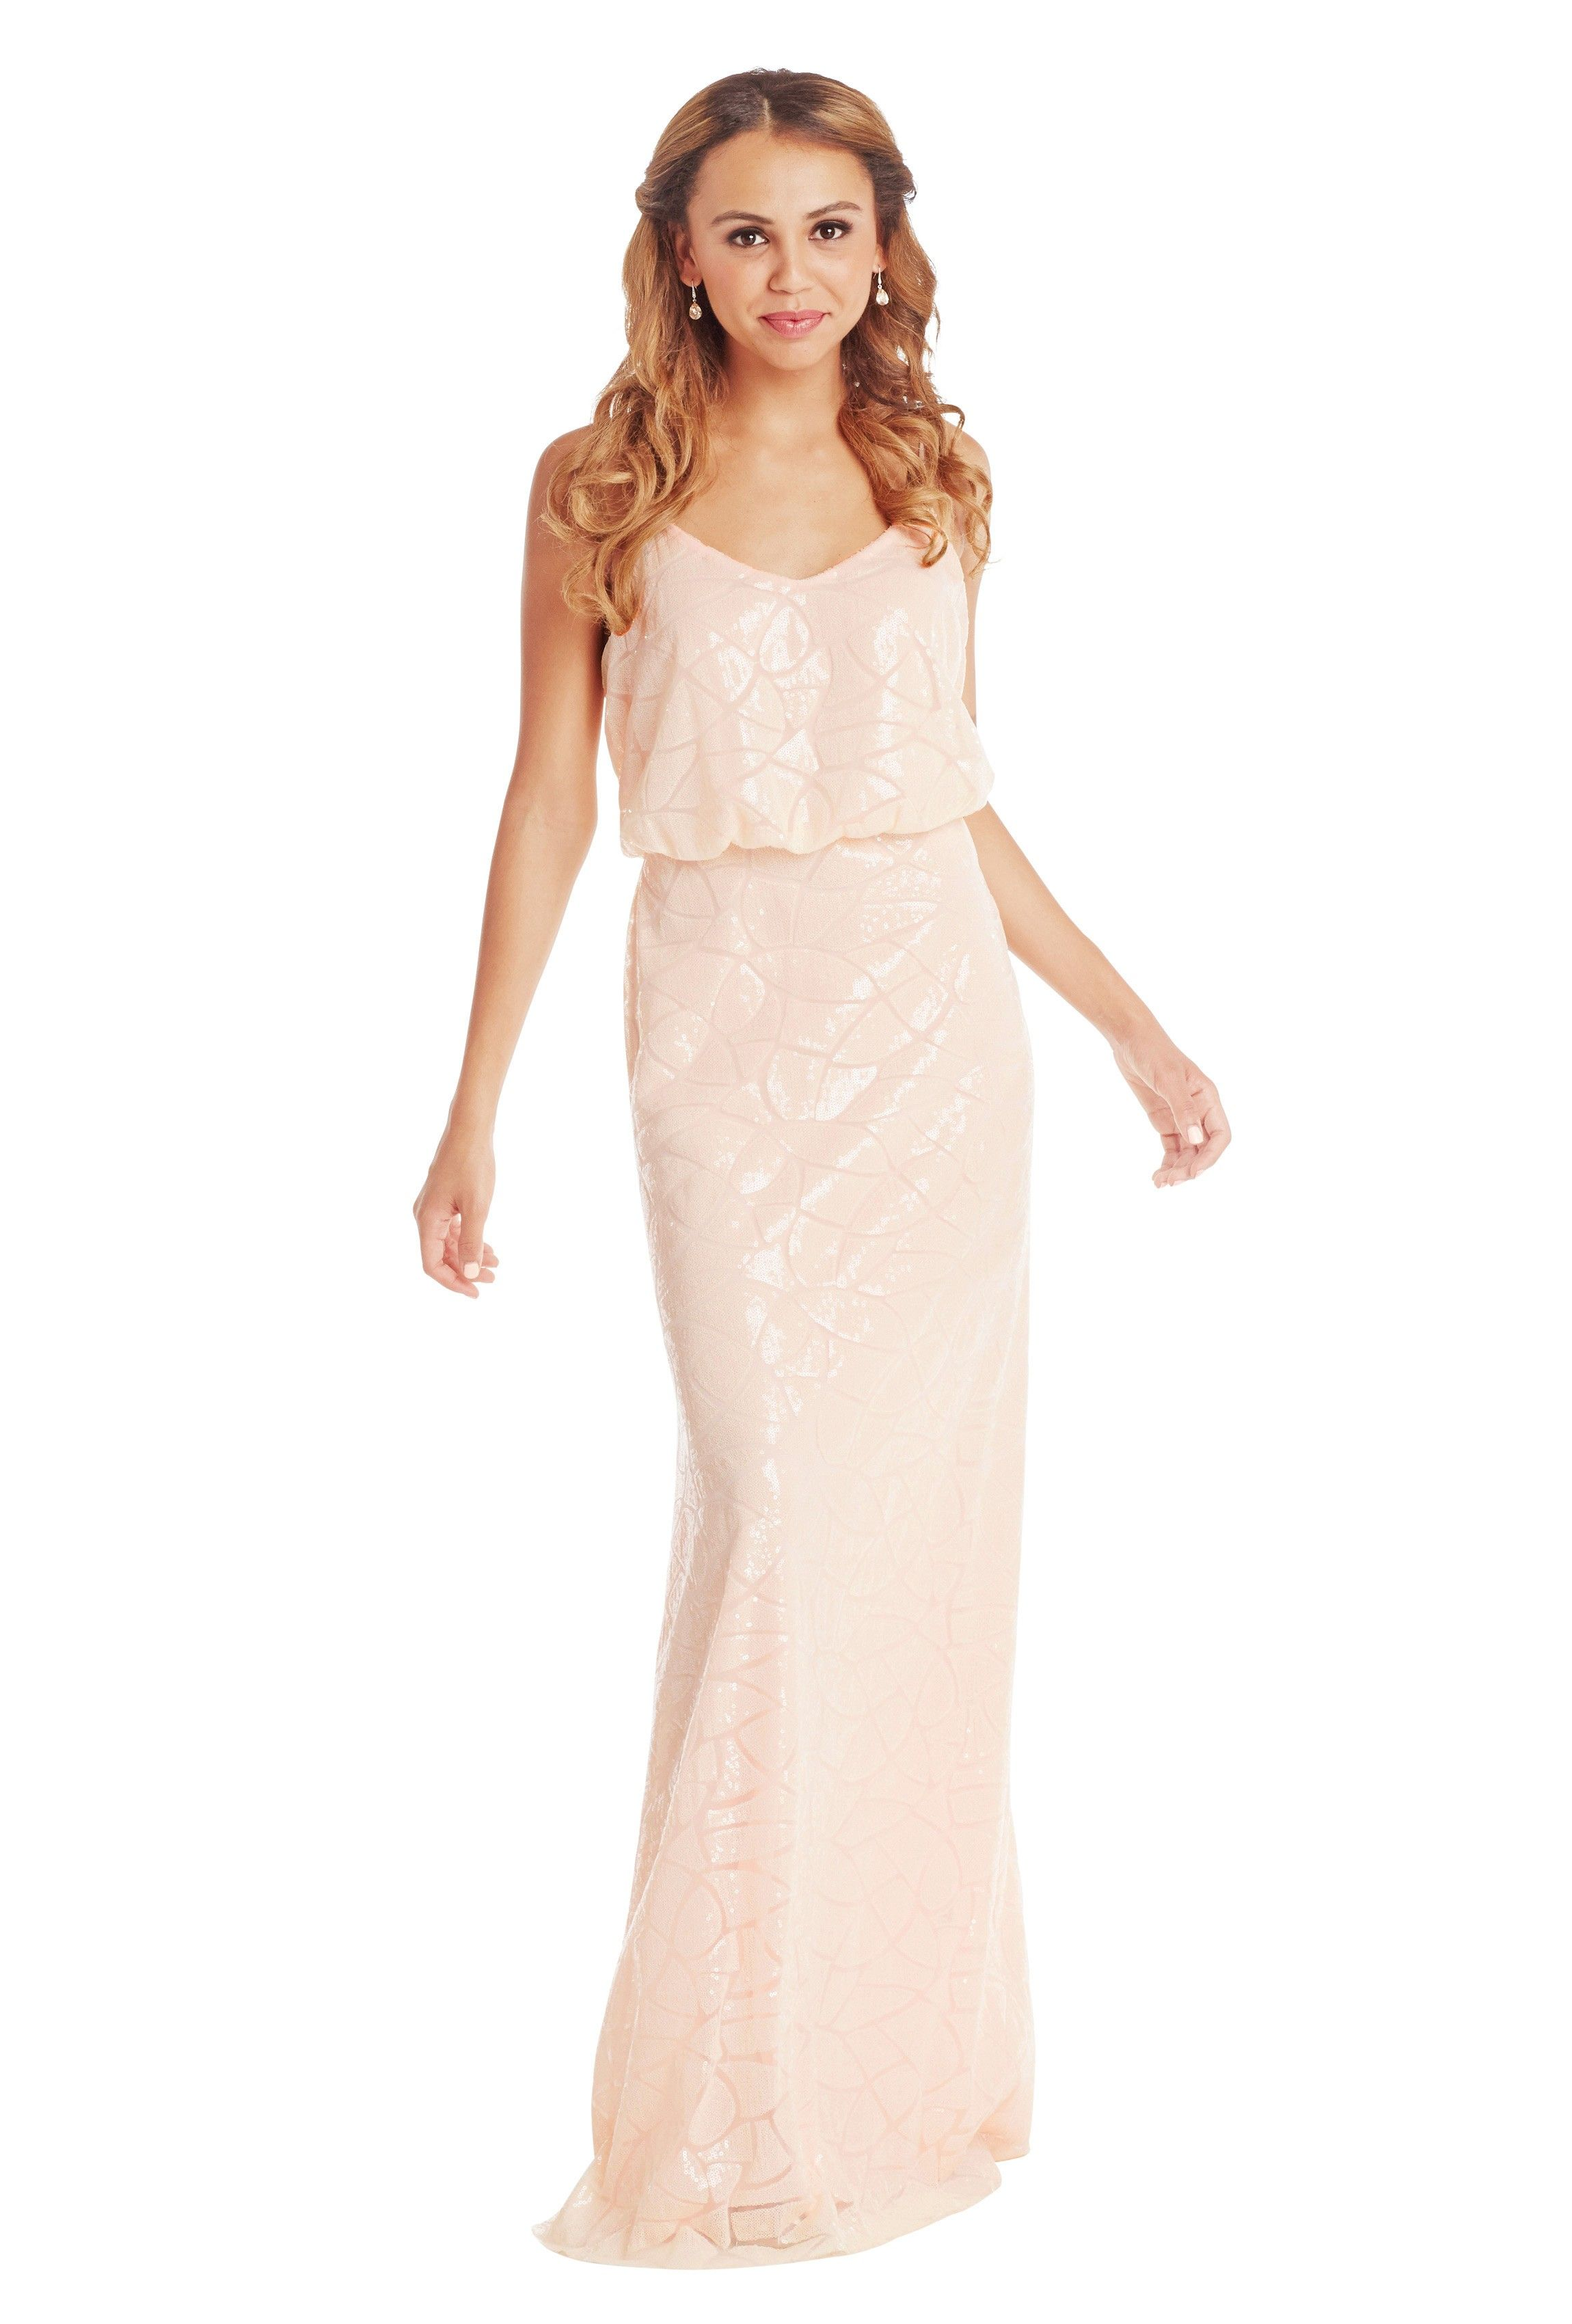 Donna morgan olive donna morgan sequin bridesmaid and olive donna morgan olive olive bridesmaid dressesdesigner ombrellifo Gallery